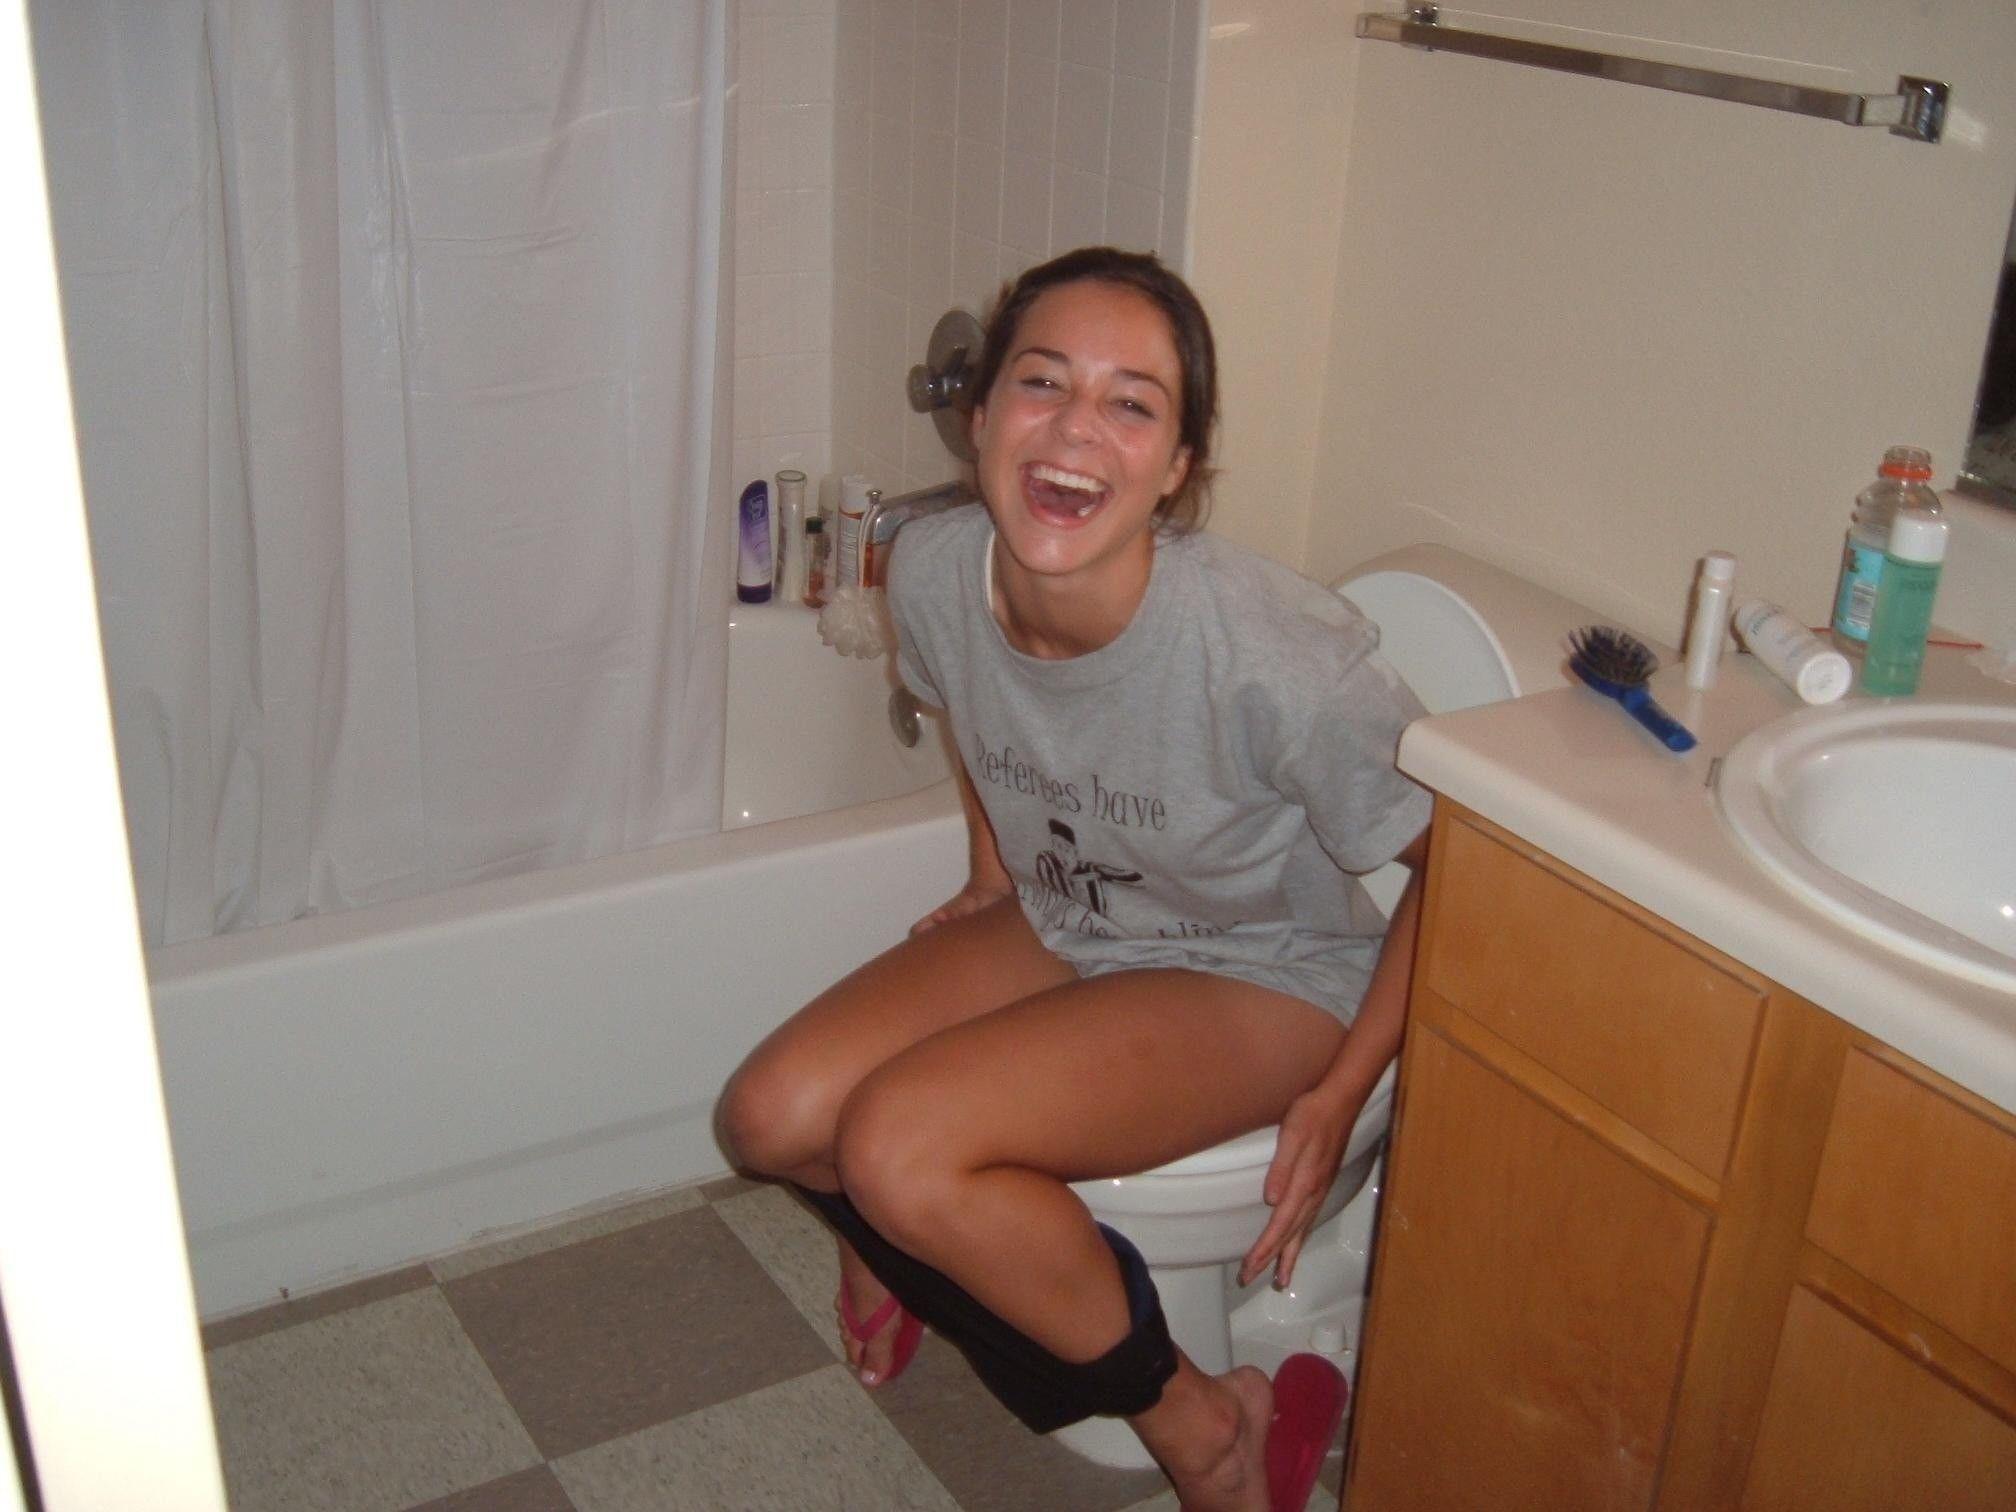 Naked girl peeing in public bathroom sink interesting. You